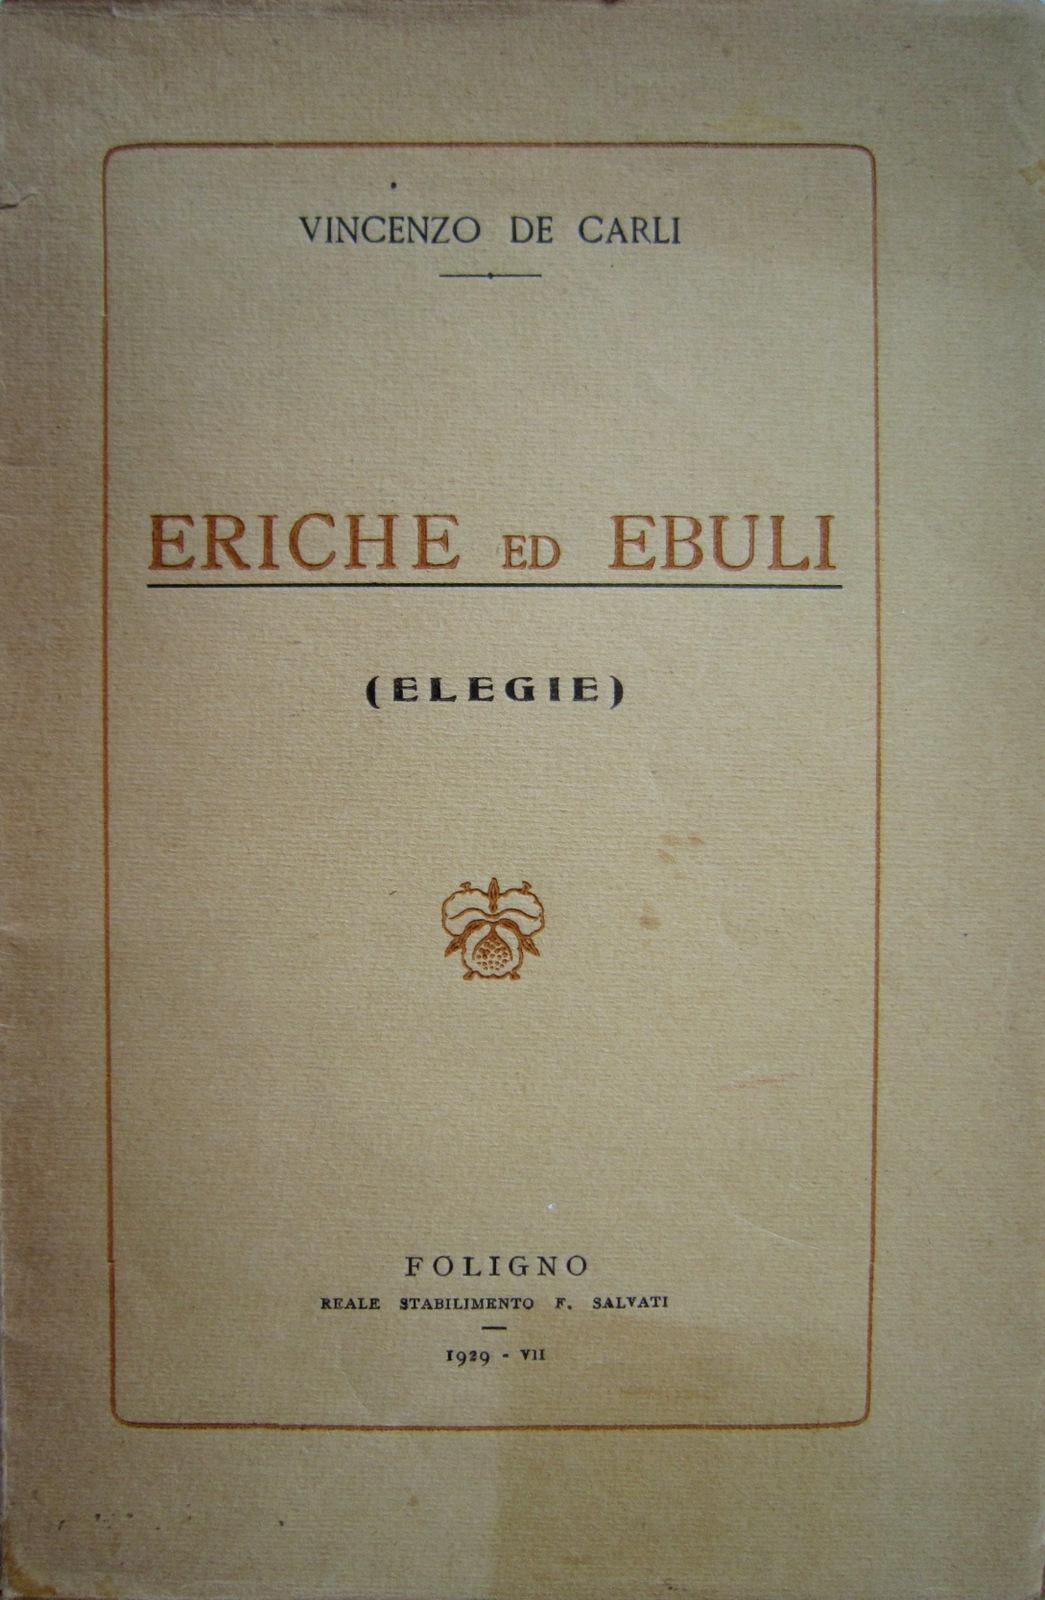 Eriche ed ebuli